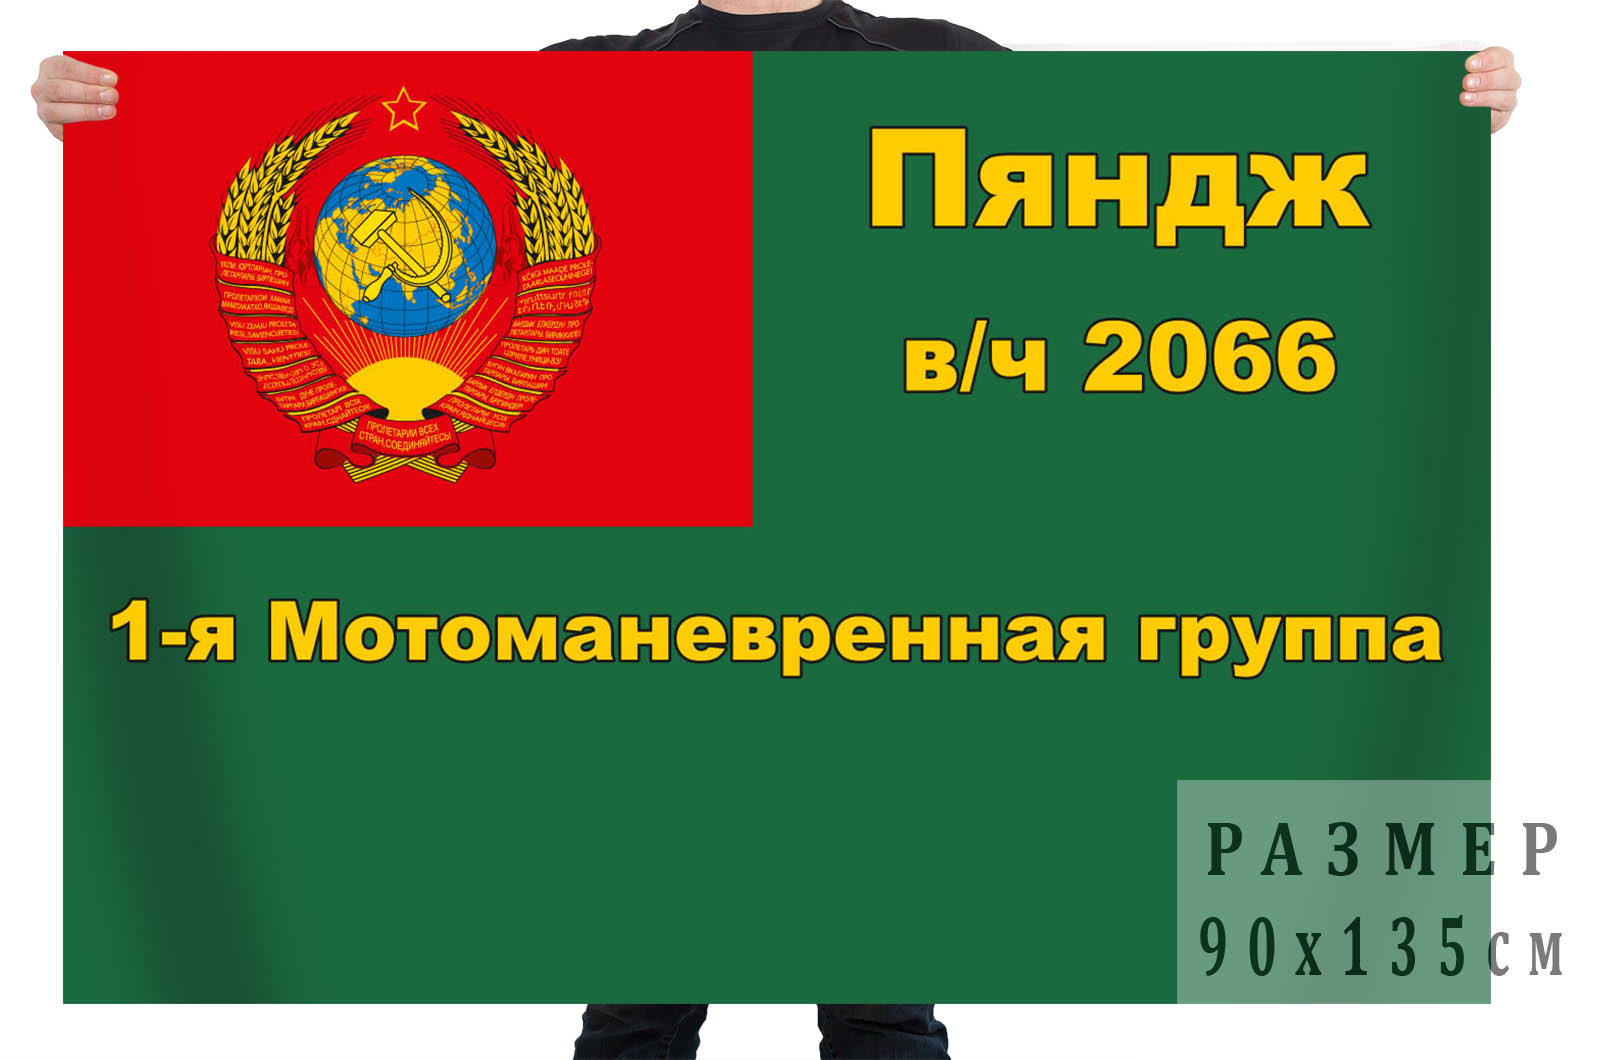 Флаг Пяндж в/ч 2066 – 1-я Мотоманевренная группа